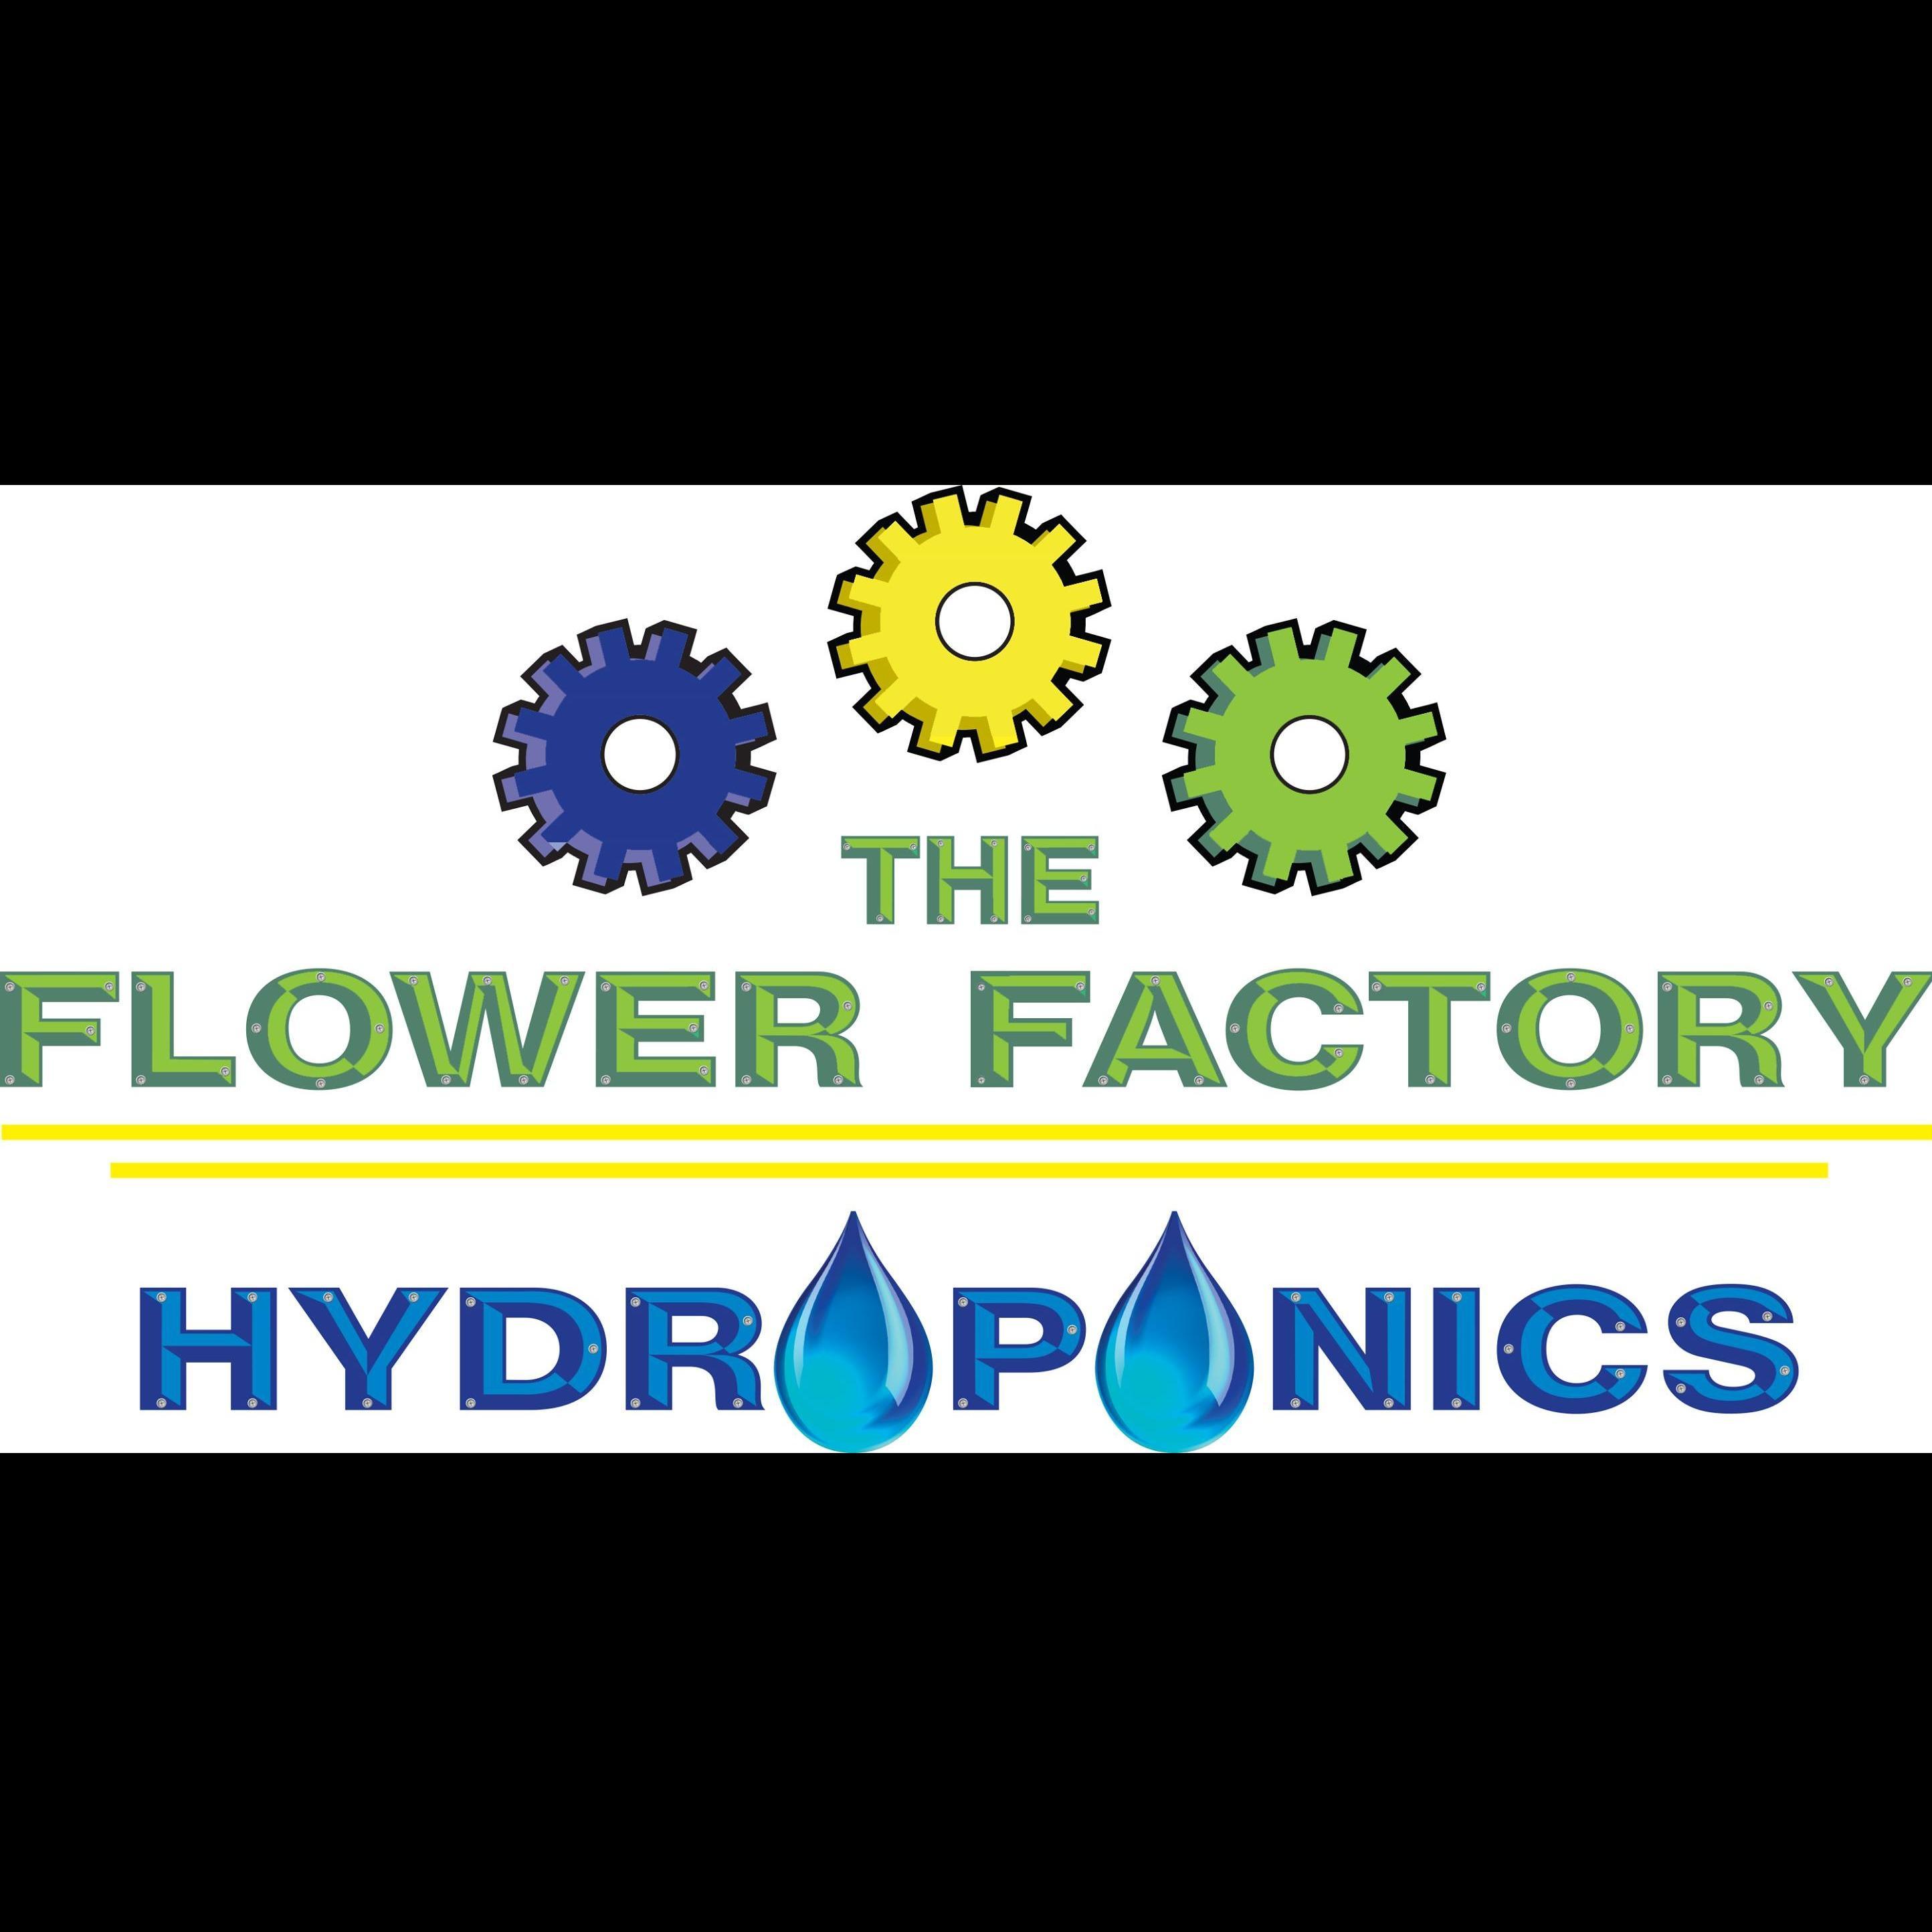 Flower Factory Hydroponics